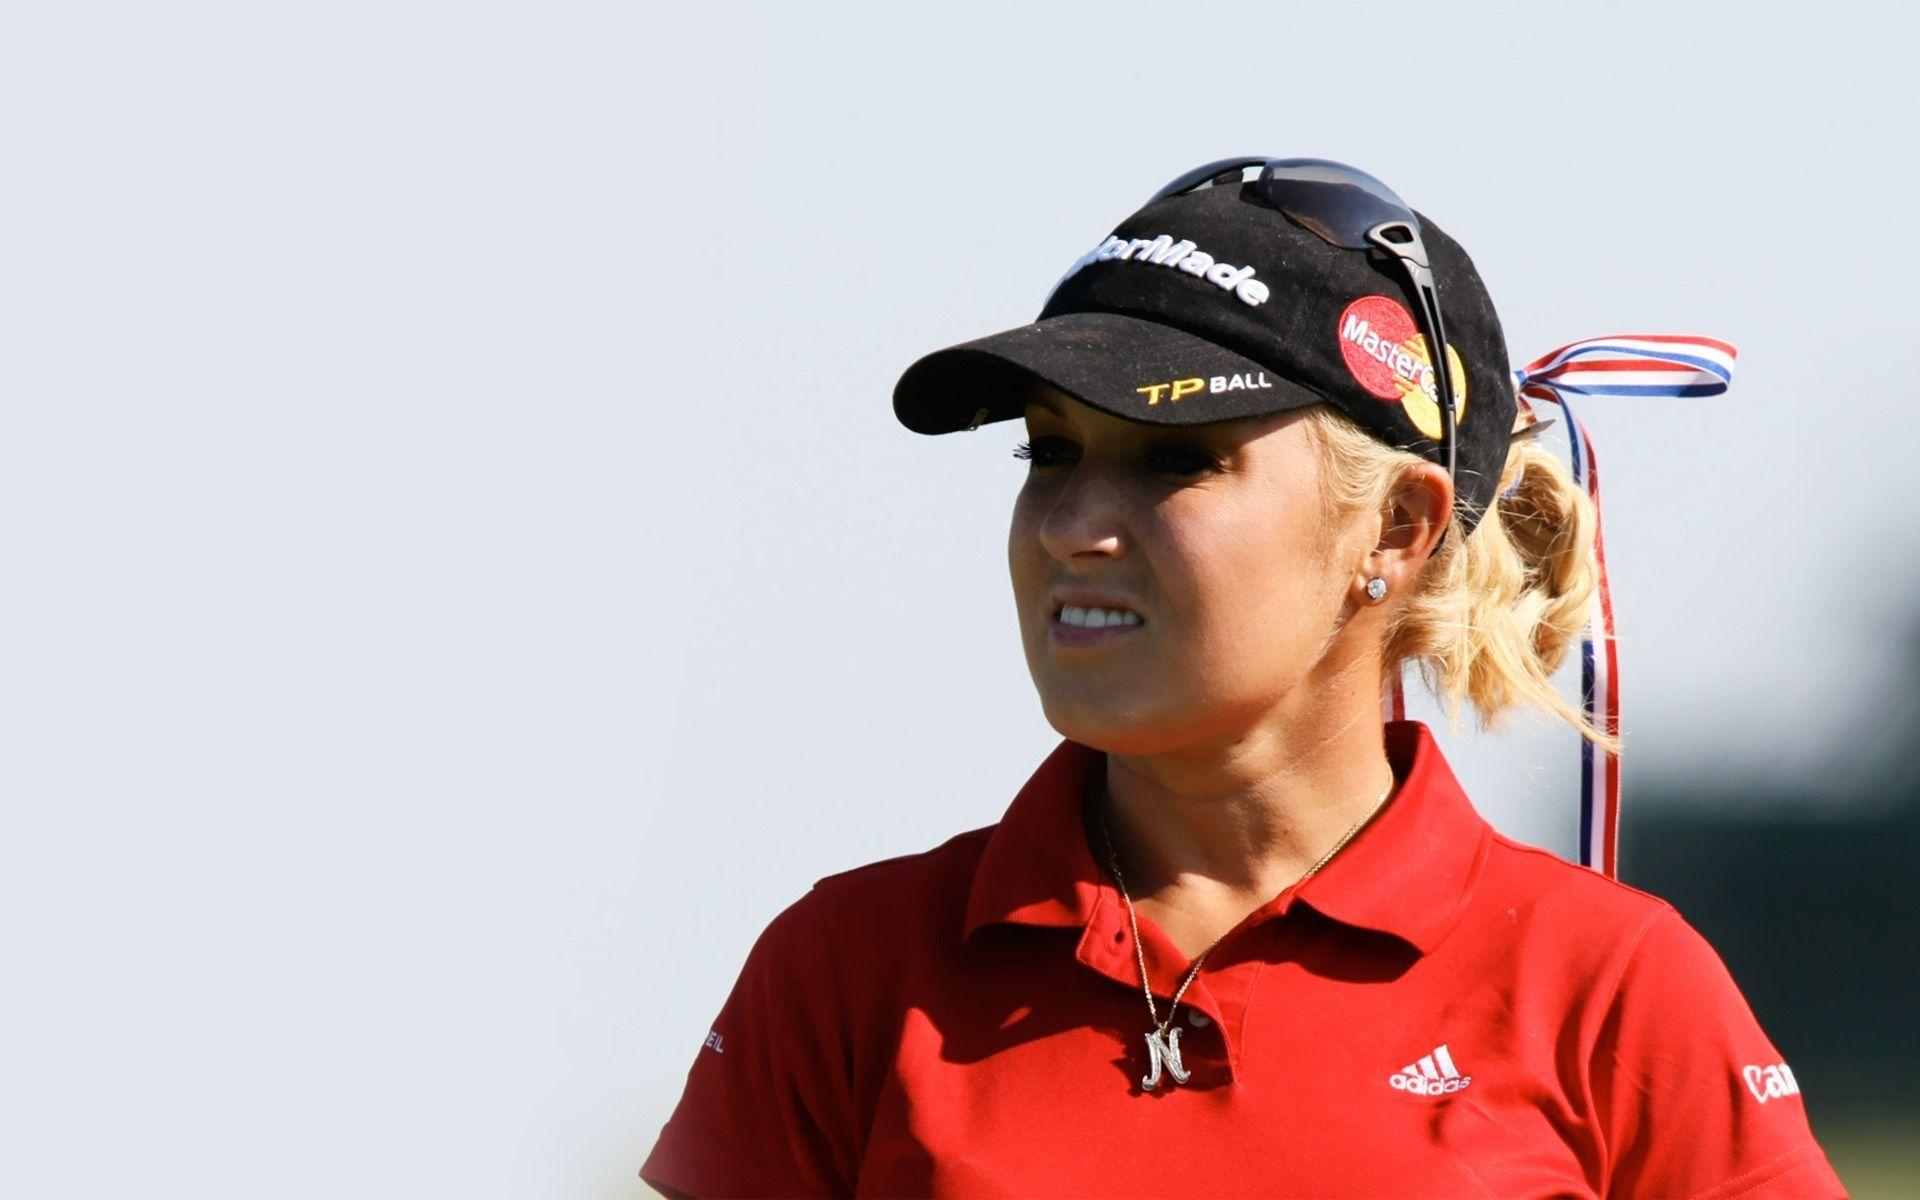 48 best GIRLS GOLF images on Pinterest | Girls golf, Golfers and ...